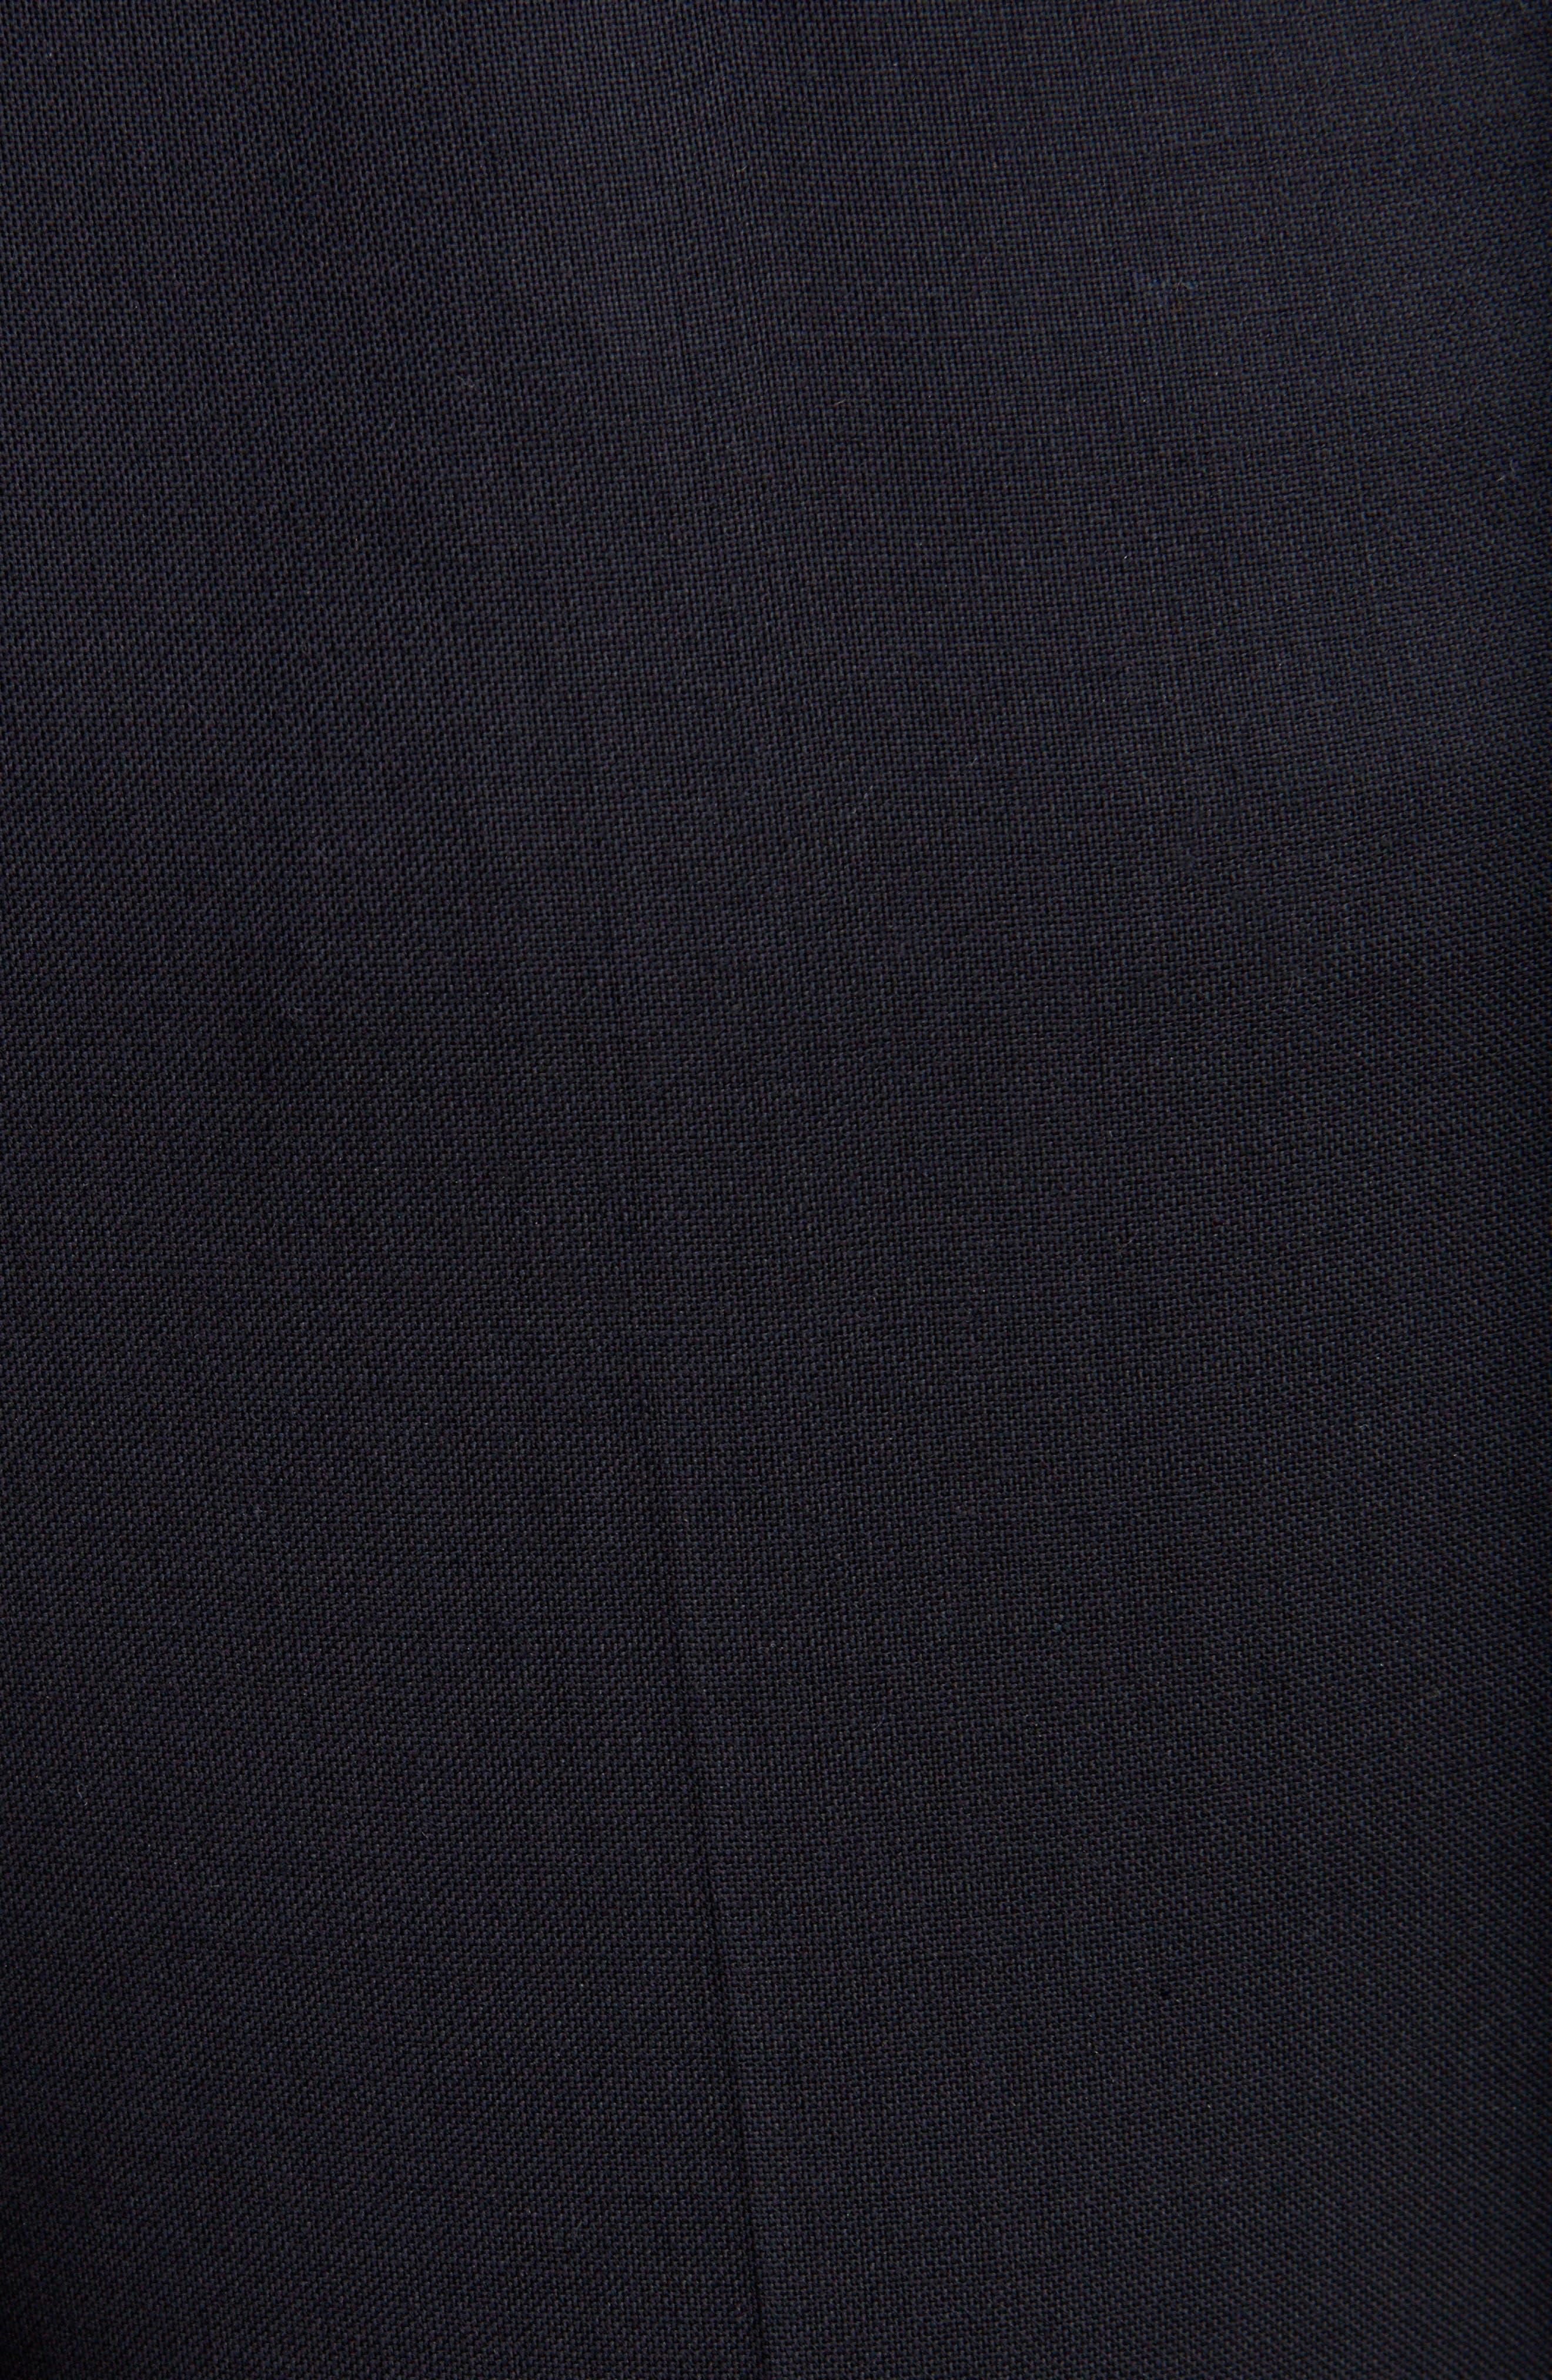 Tropical Wool Suit Trousers,                             Alternate thumbnail 10, color,